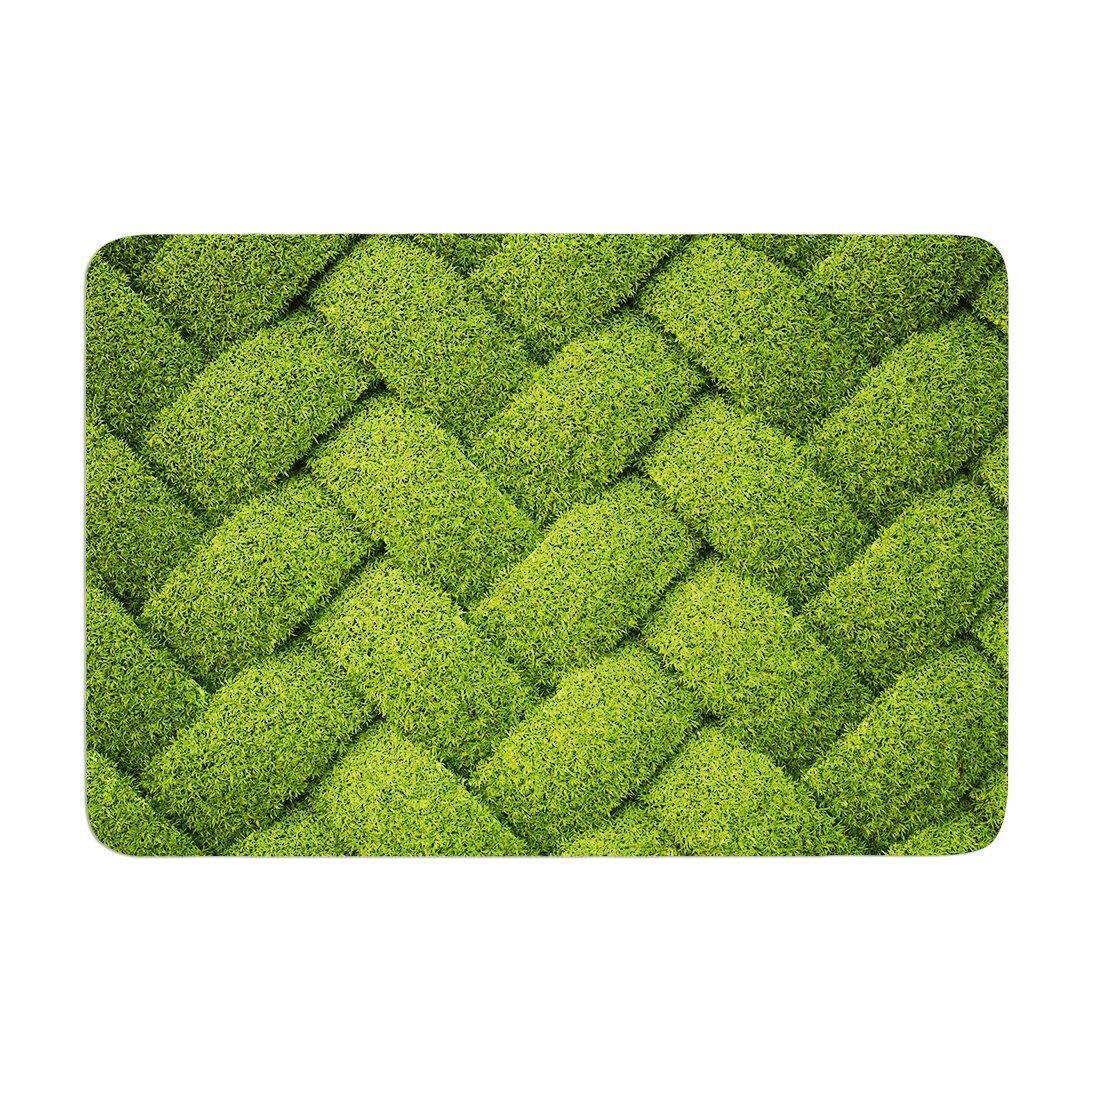 Kess InHouse Susan Sanders Ivy Basket Green Weave Memory Foam Bath Mat 17 by 24